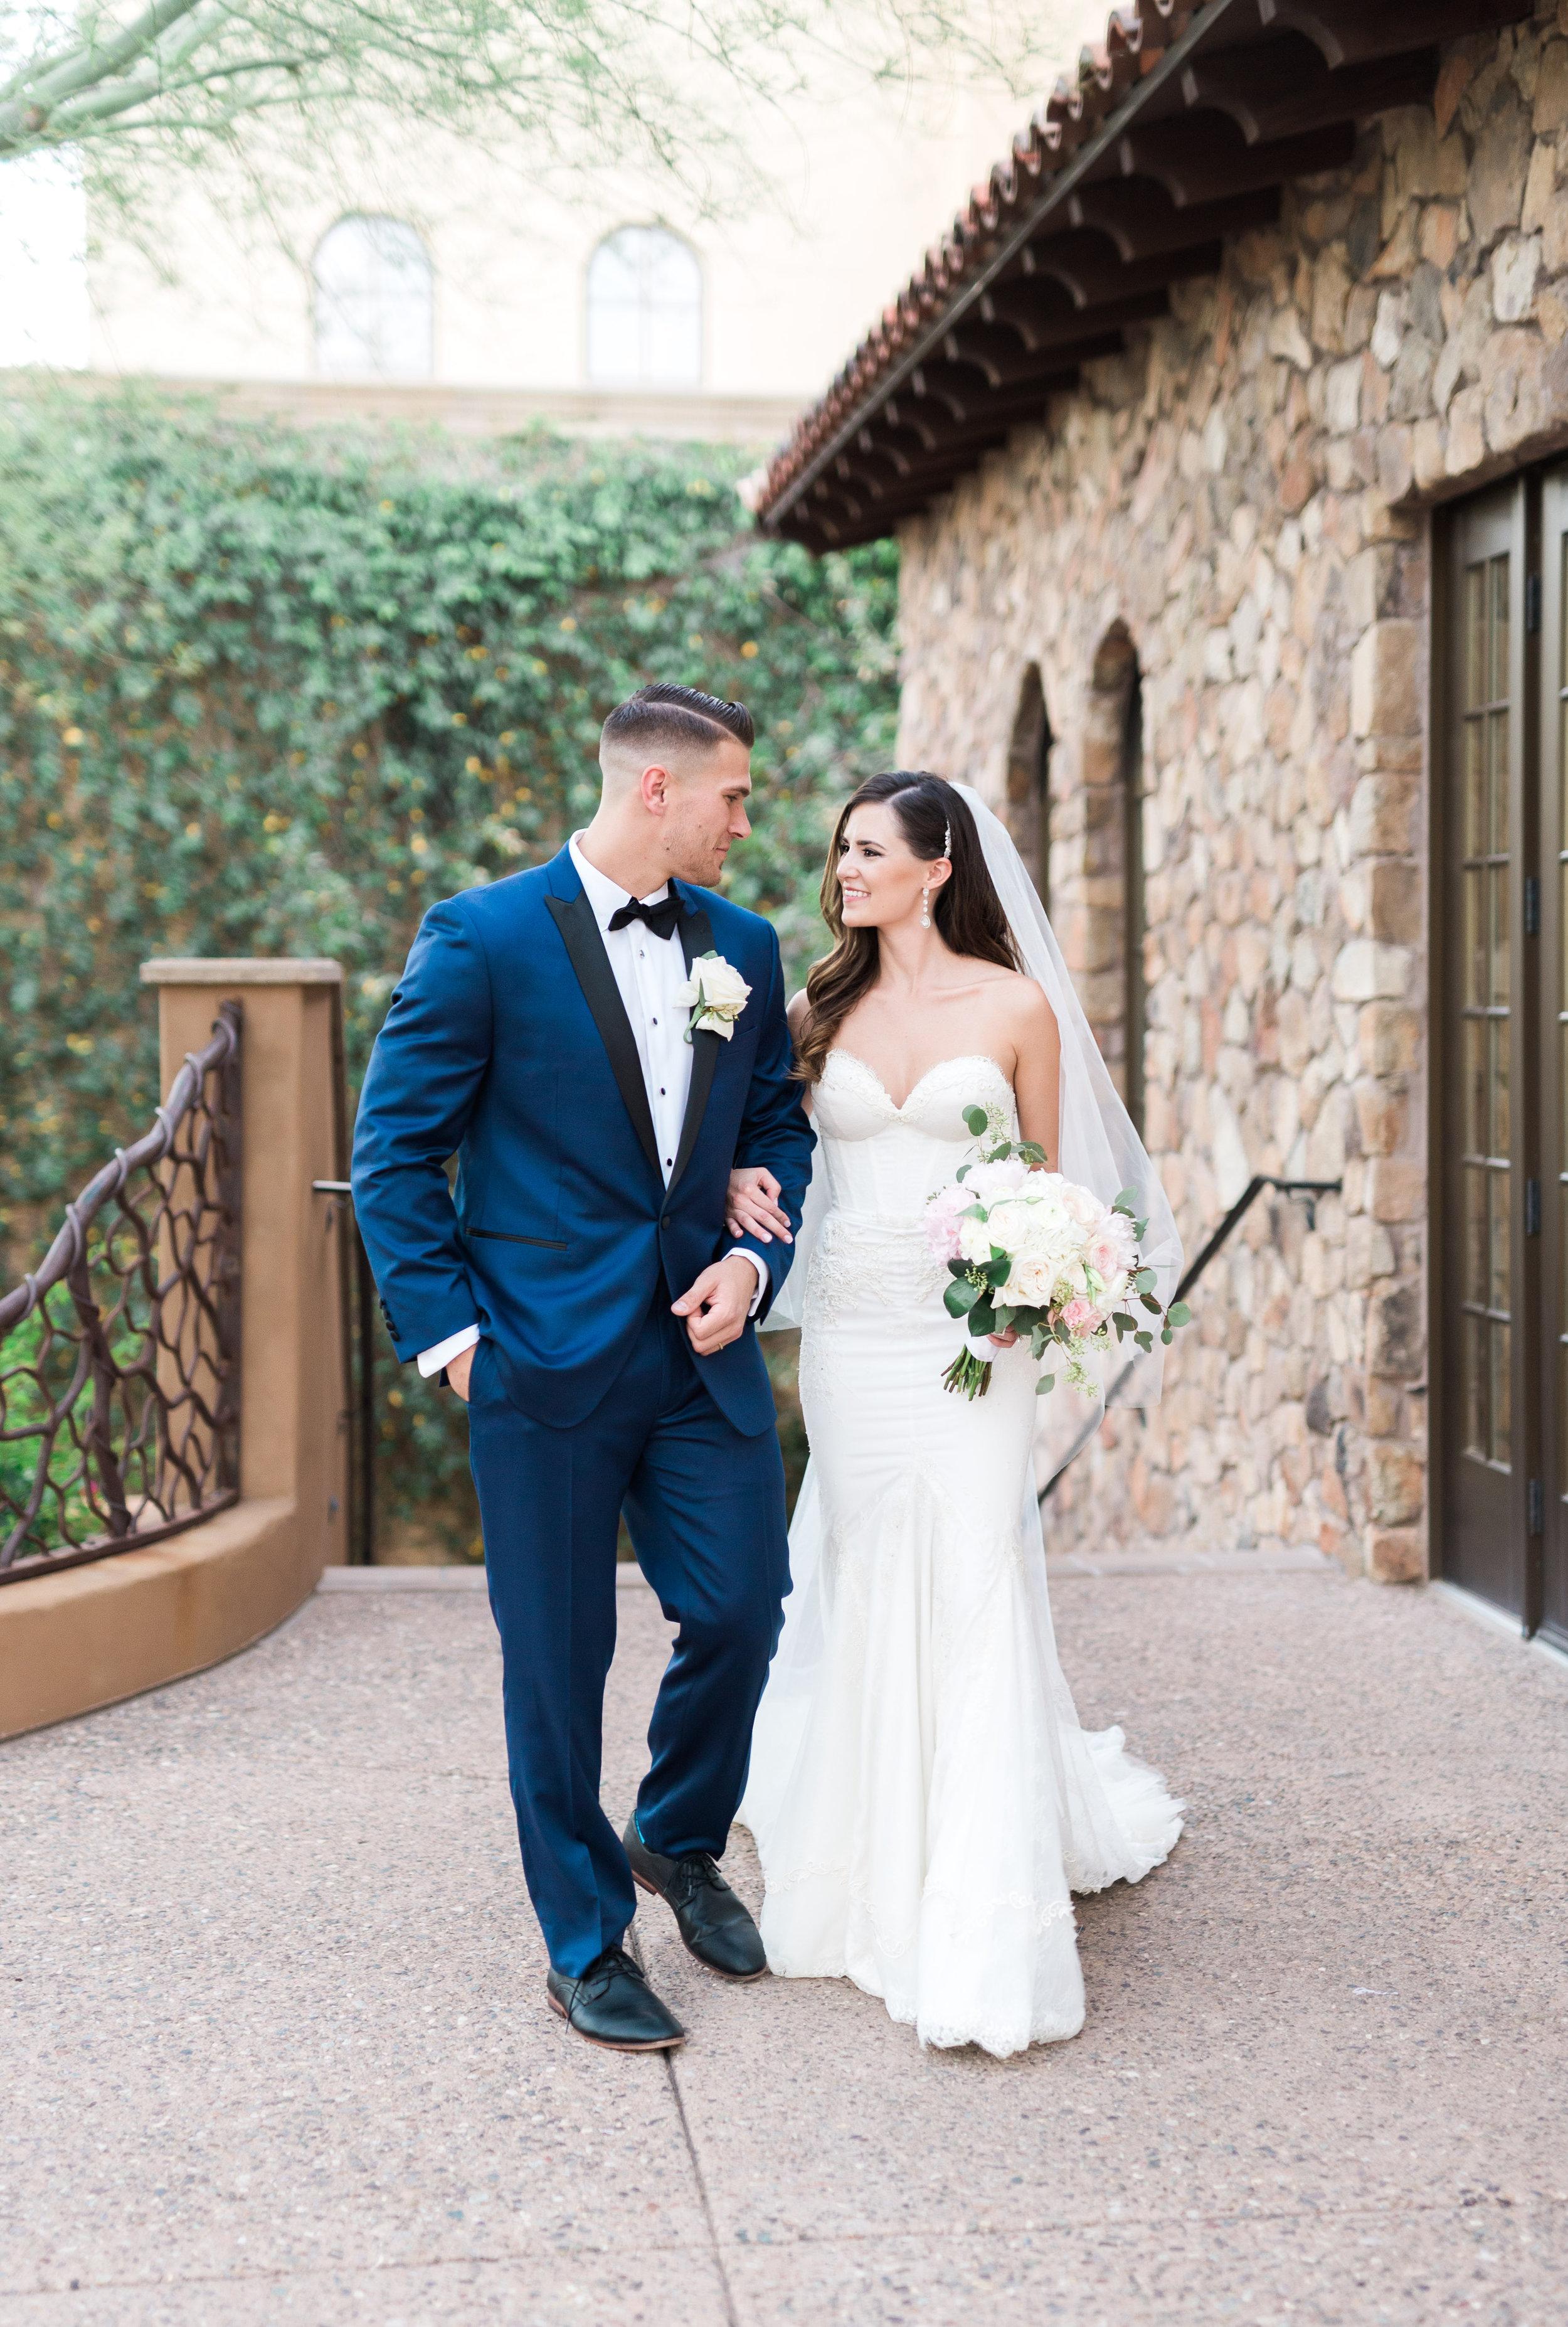 WEDDING    Cassandra & Robert     Blackstone Country Club, Vistancia, AZ